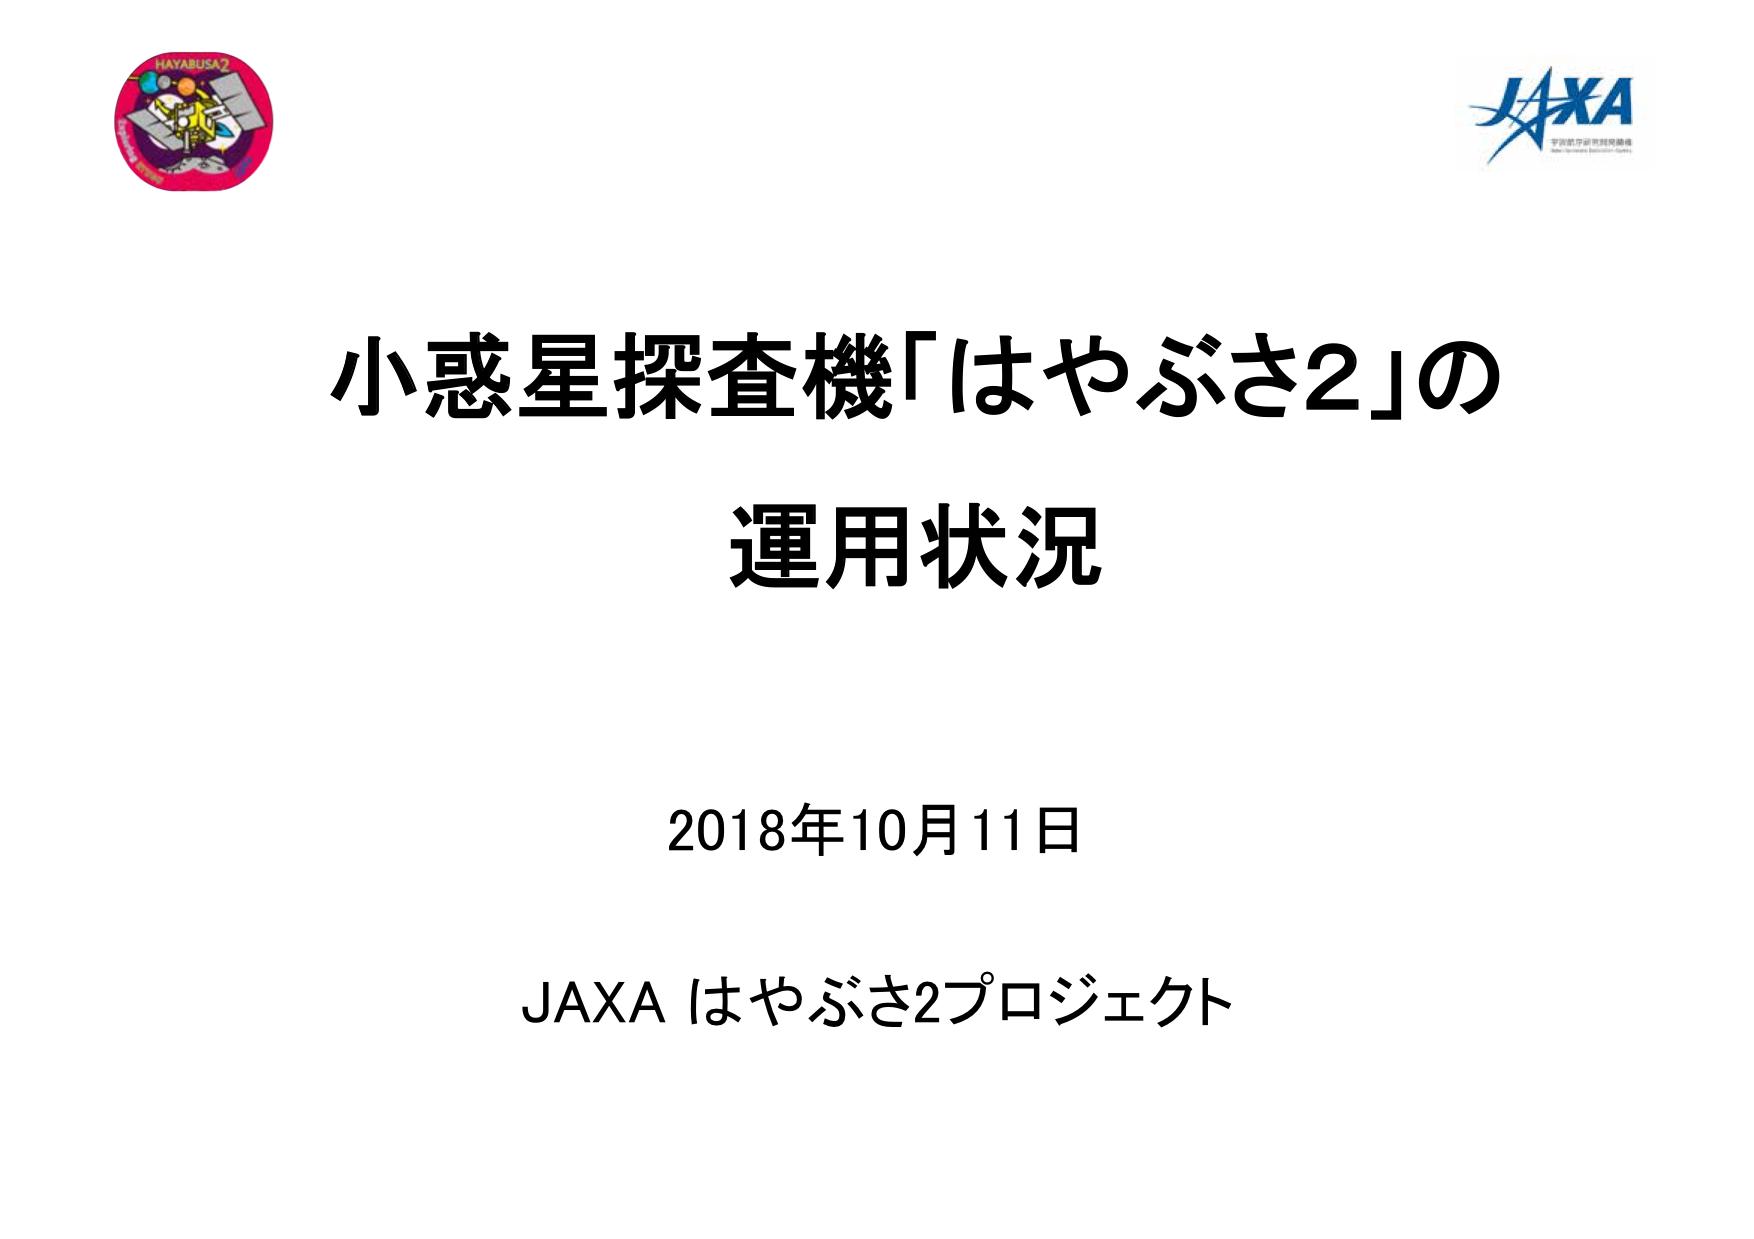 f:id:Imamura:20181011153940p:plain